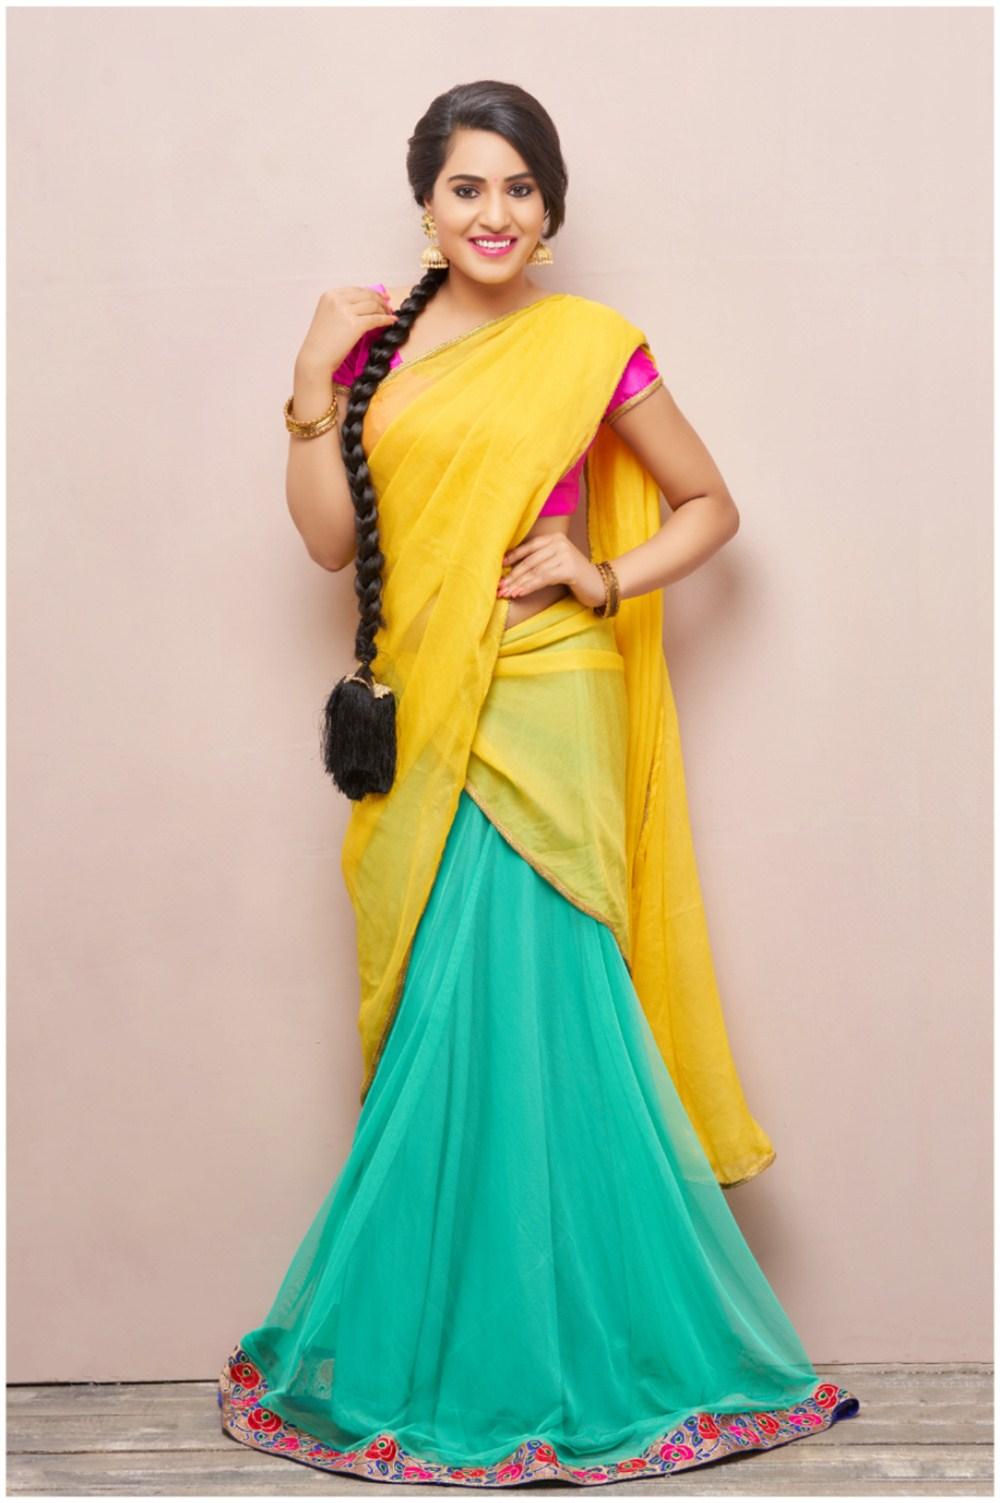 Actress Arshitha Half Saree Photo Shoot Images